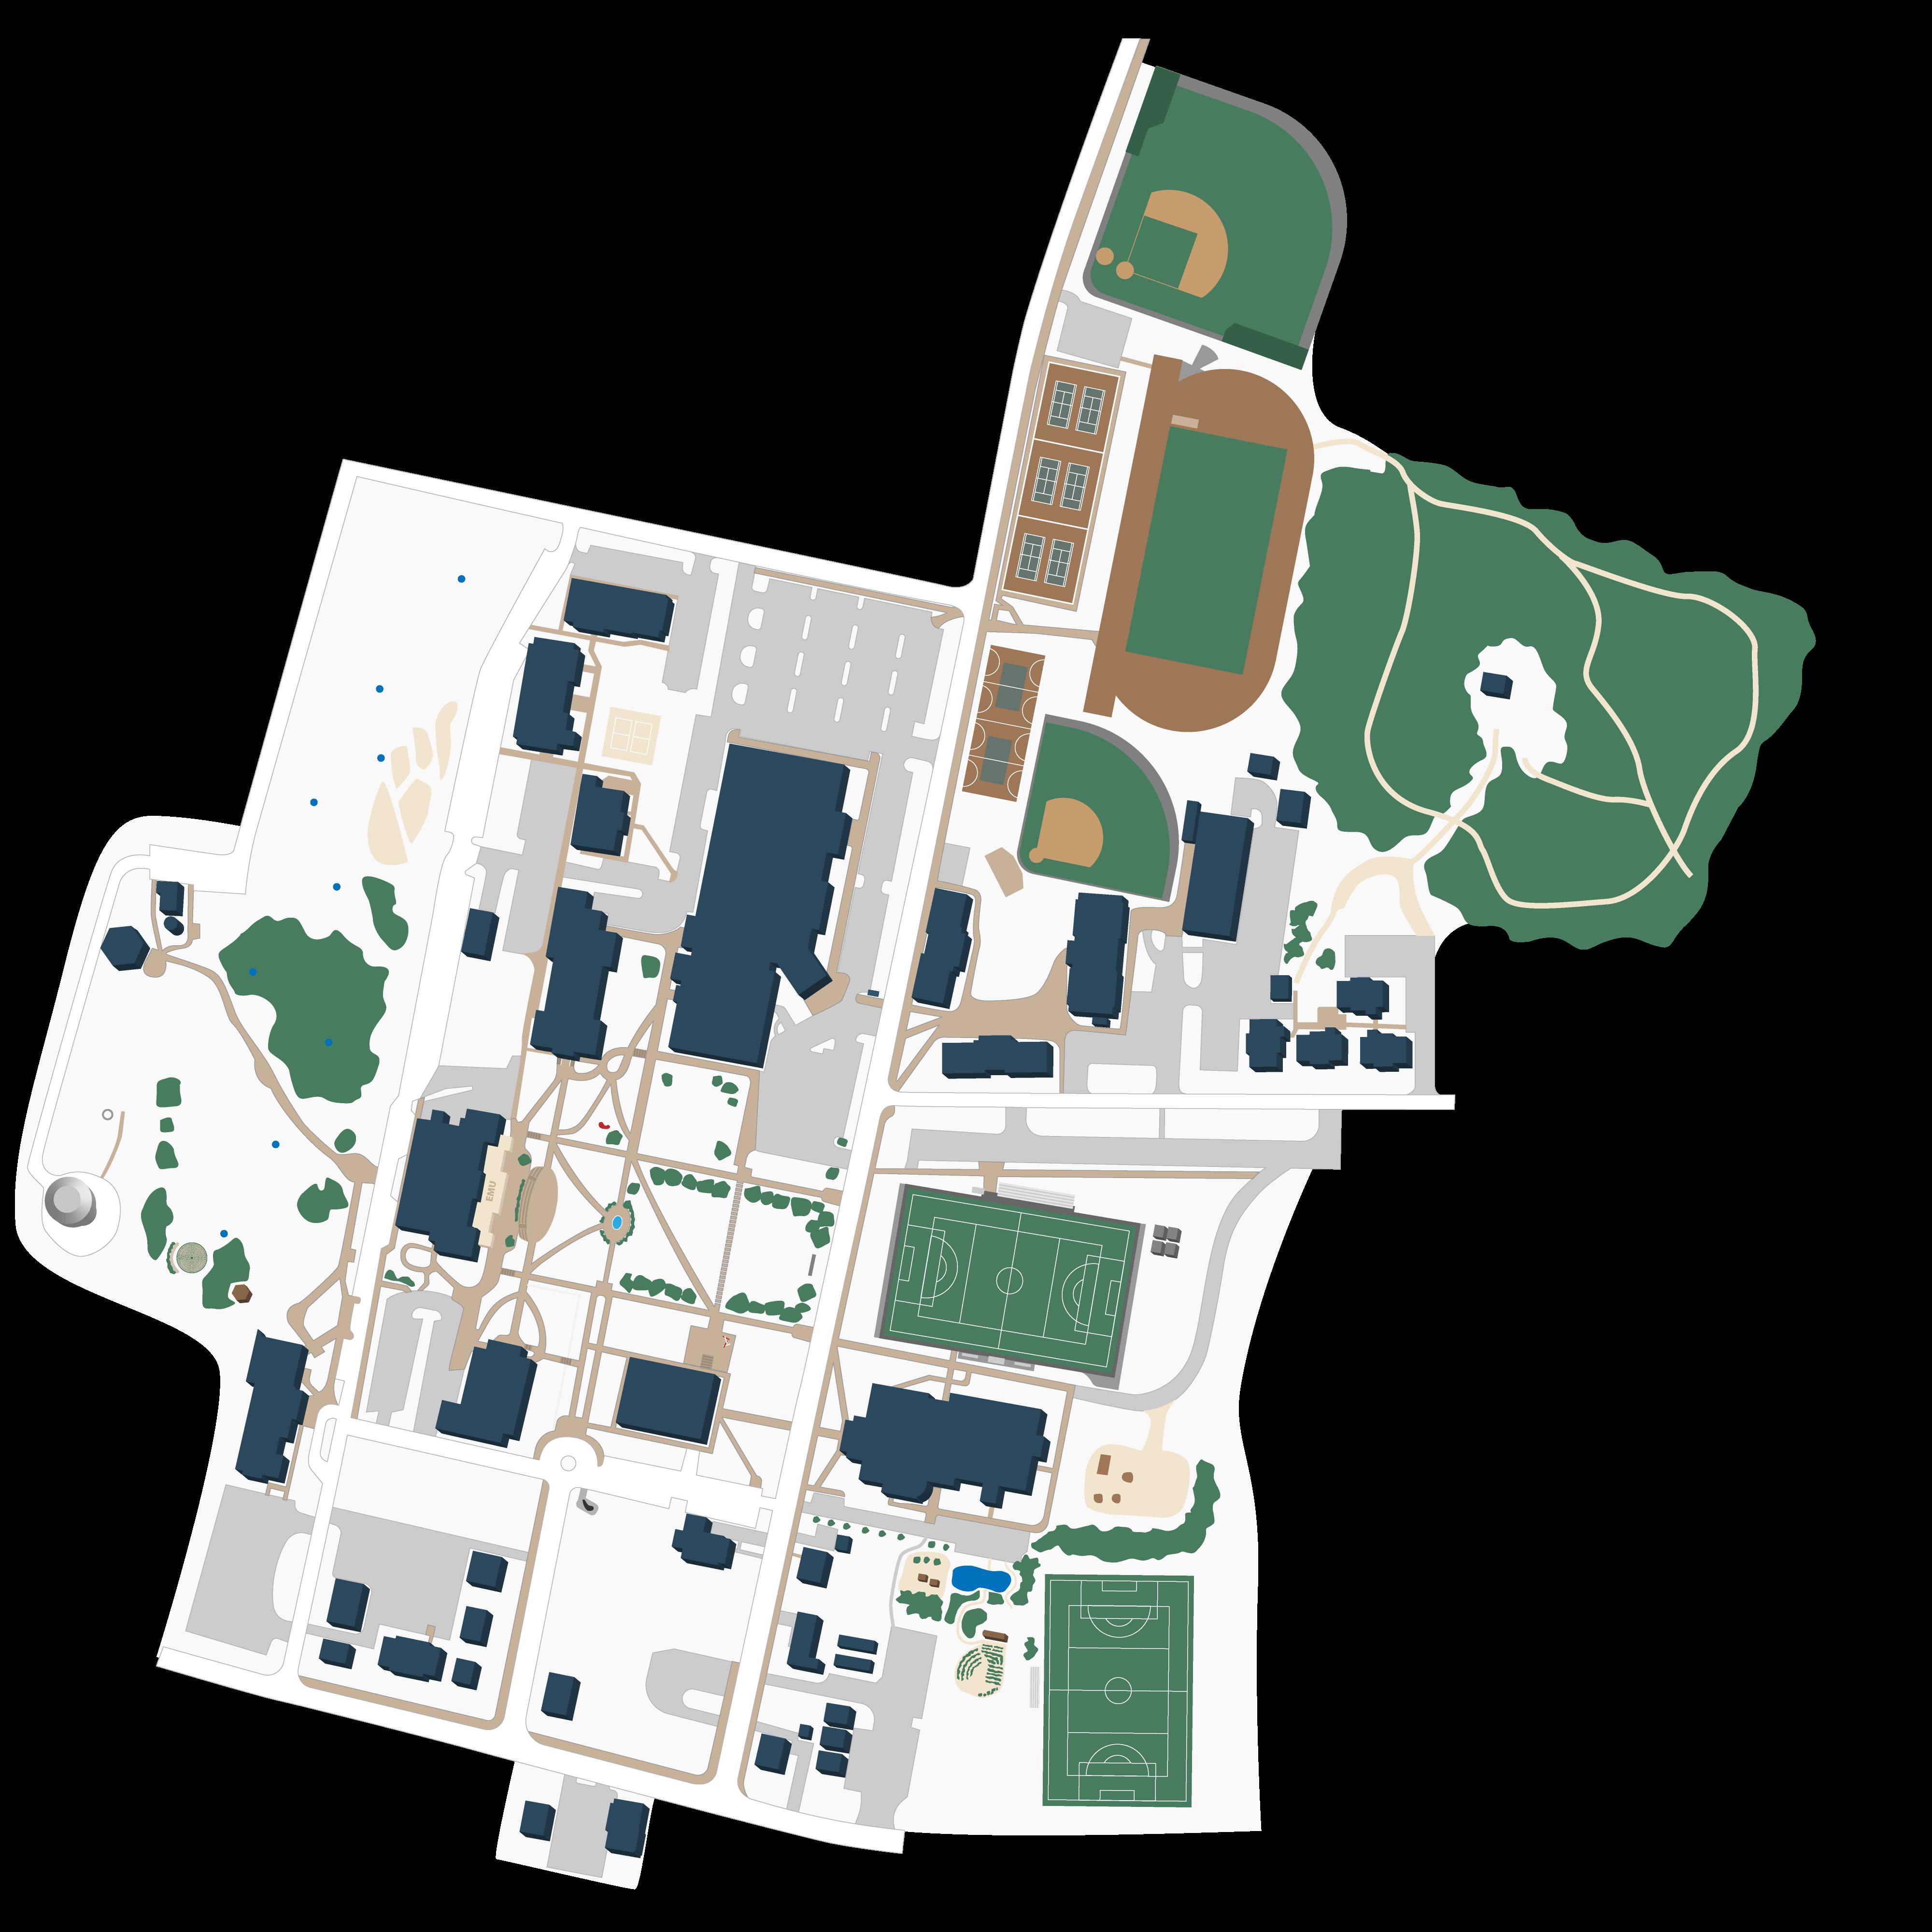 eastern university campus map Emu Campus Map Harrisonburg Campus eastern university campus map